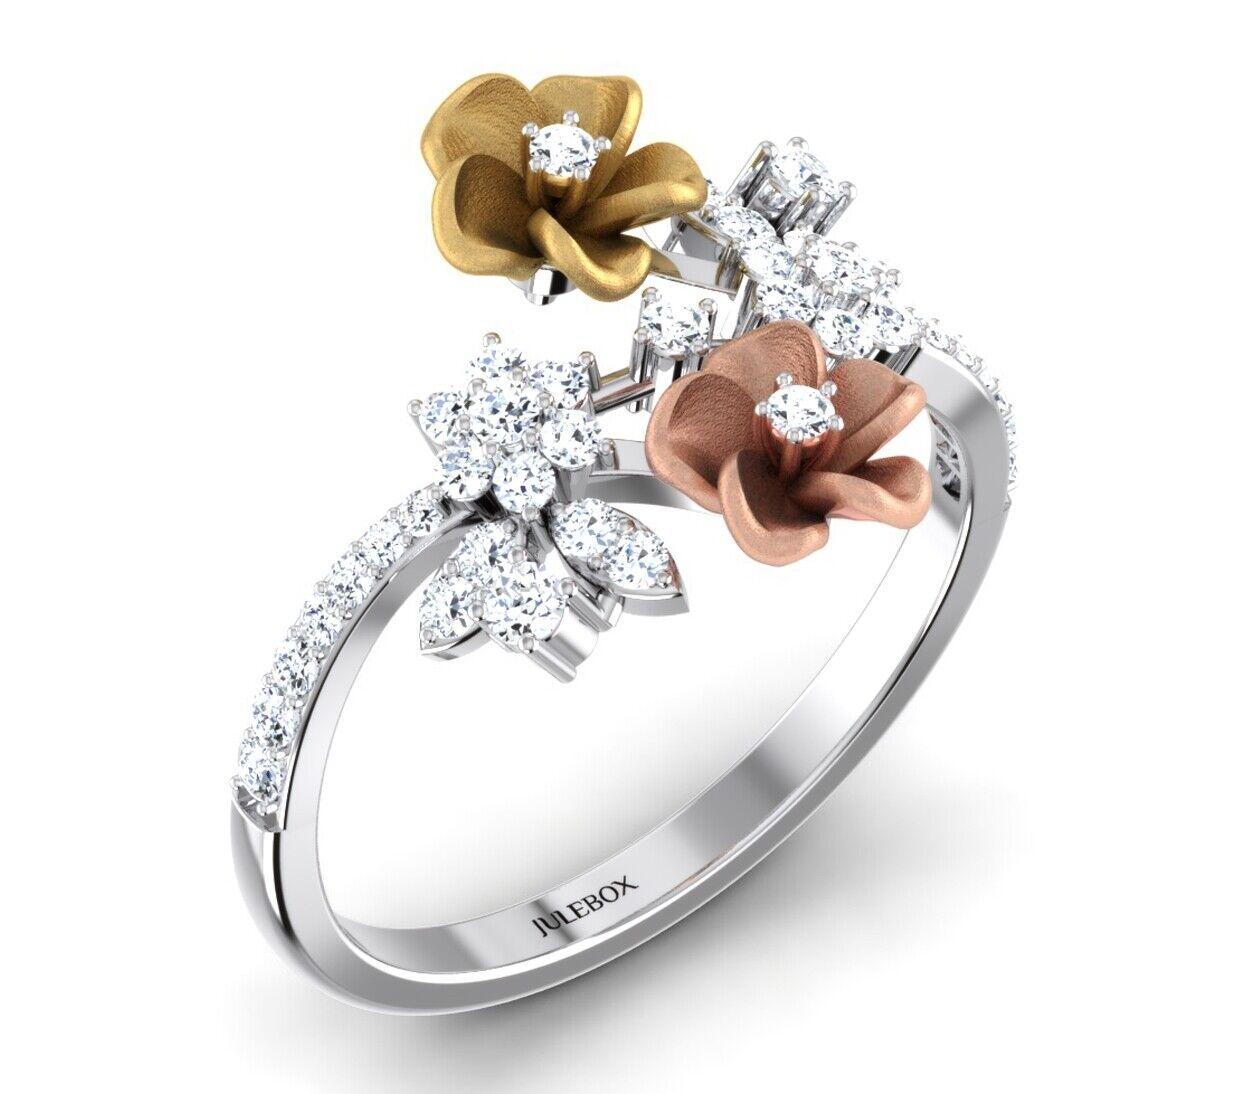 Hallmarked Ladies 9ct White gold & pink gold CZ Engagement Gemstone Jewelry Ring